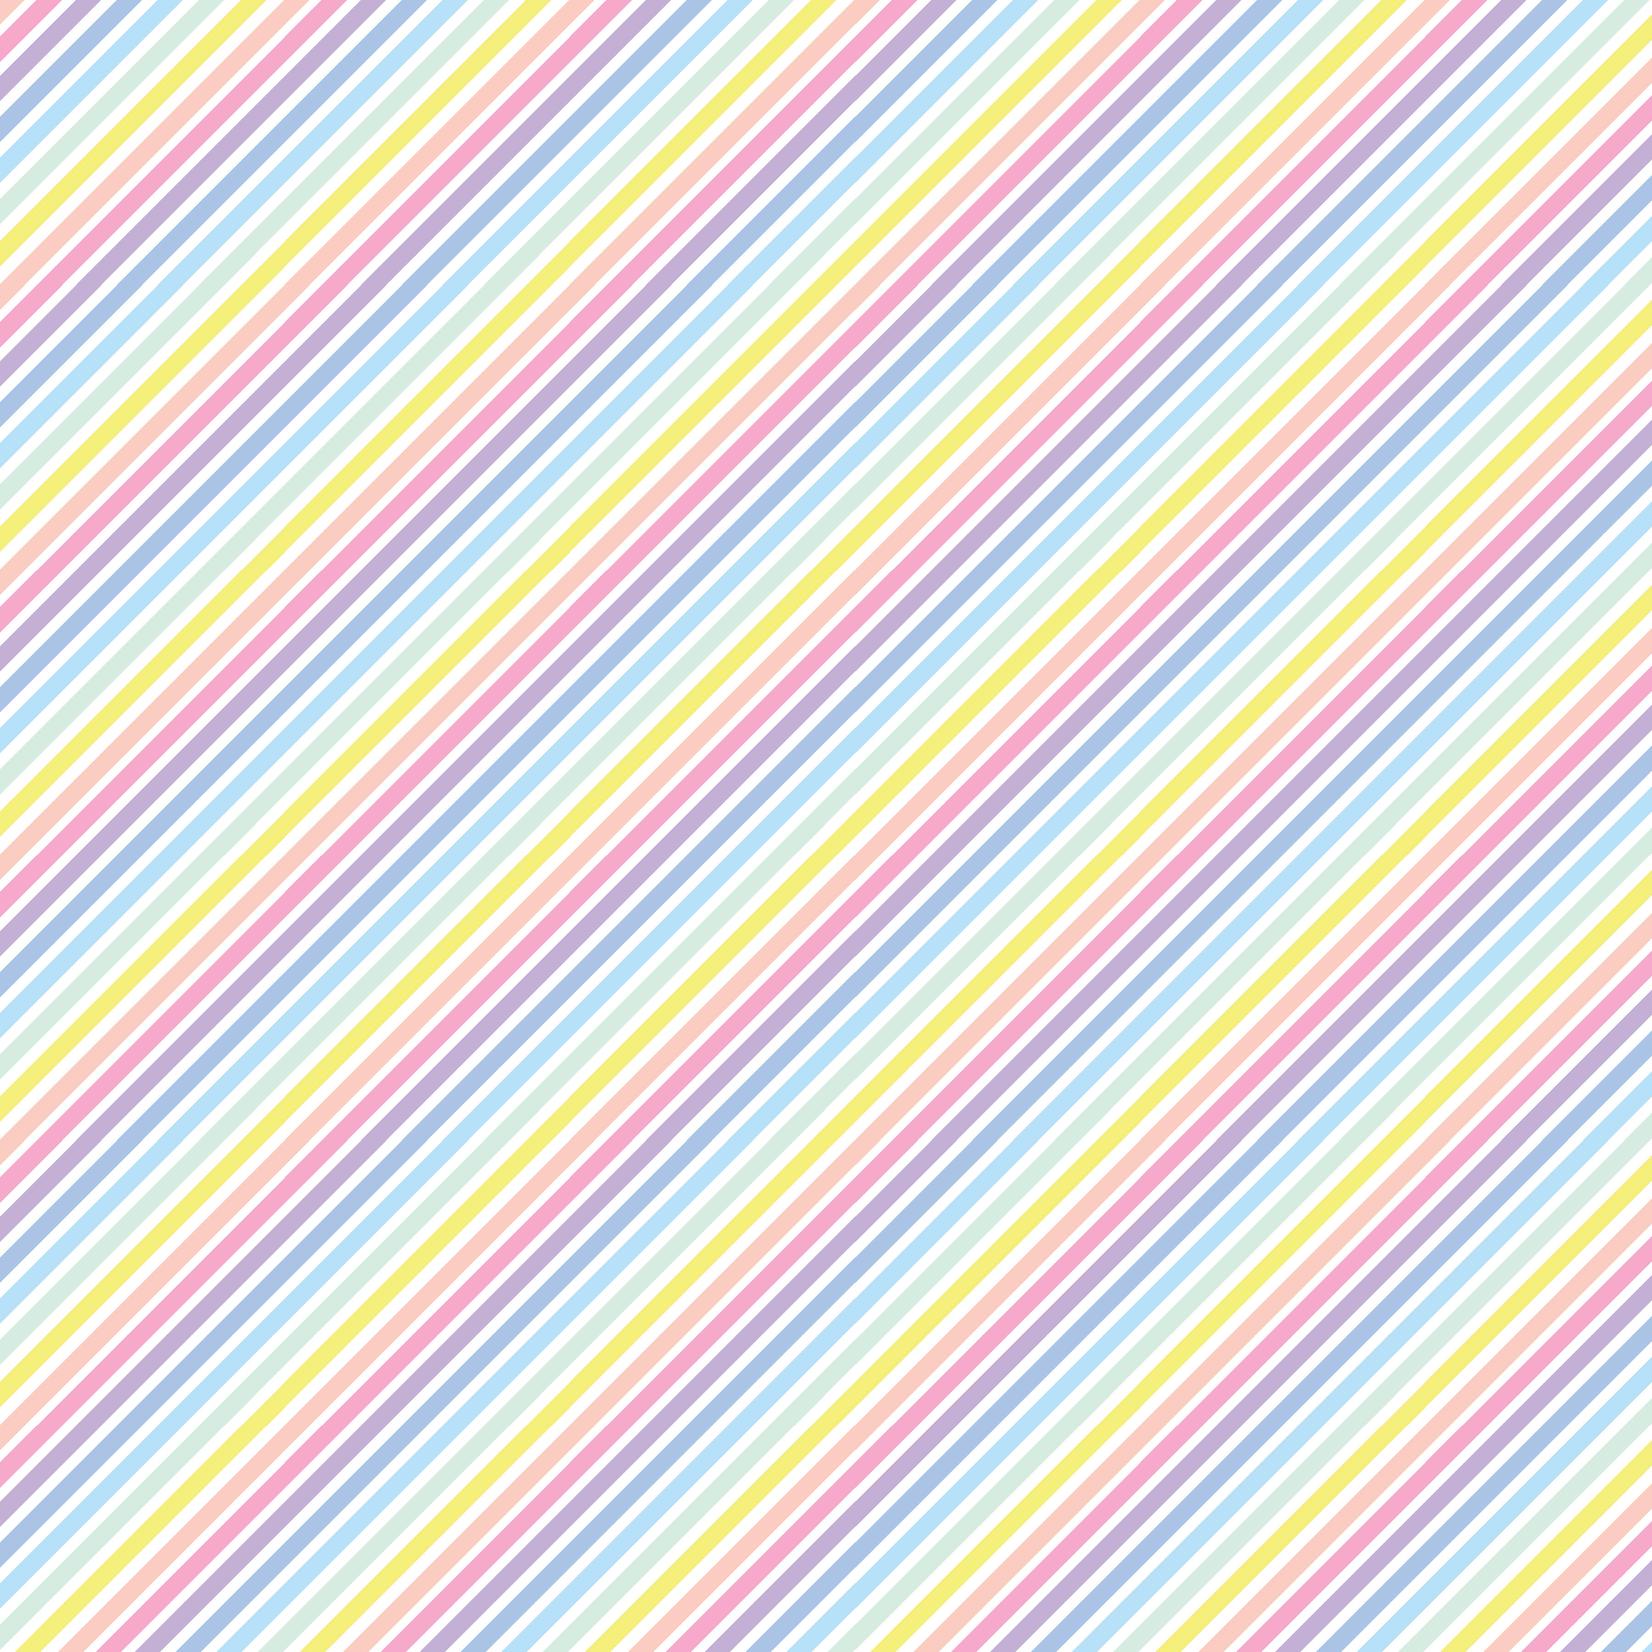 TVD Diagonal Pastel Stripes